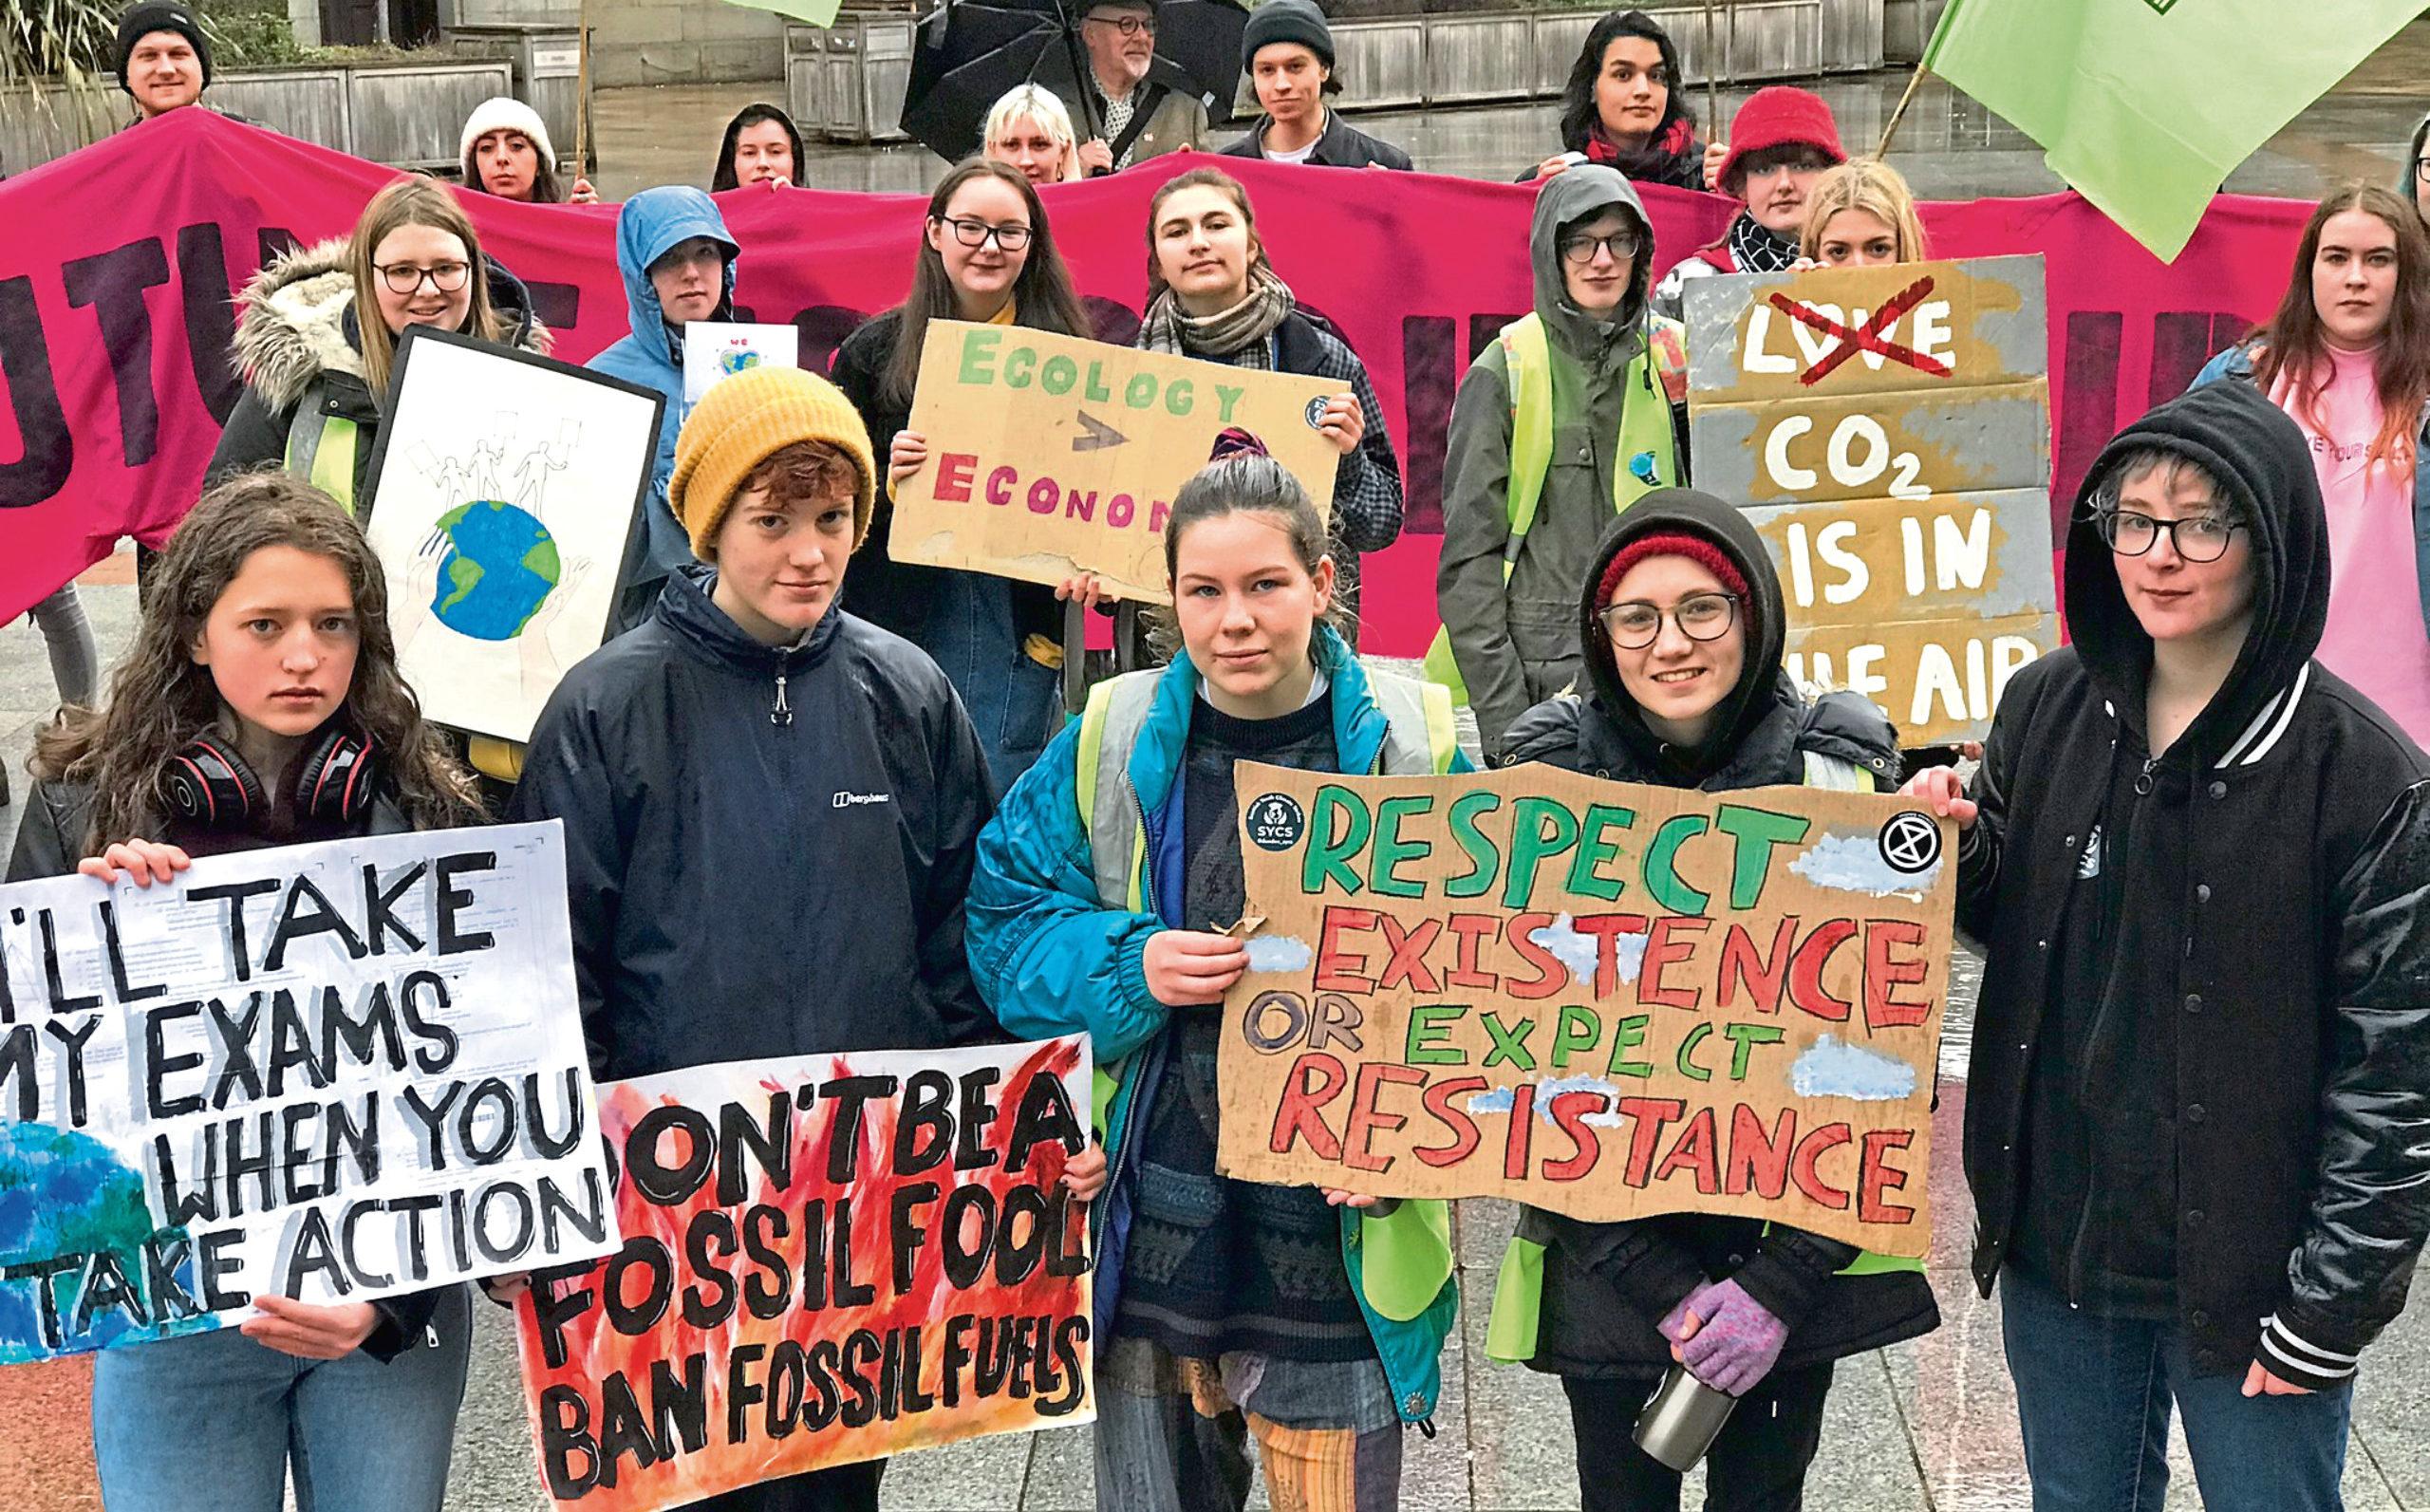 Front row shows strikers Hannah Perry, 16, Aisla Marama, 15, Hannah MacKay, 16, Elsie MacDonald, 16 and Katie Bath, 14.